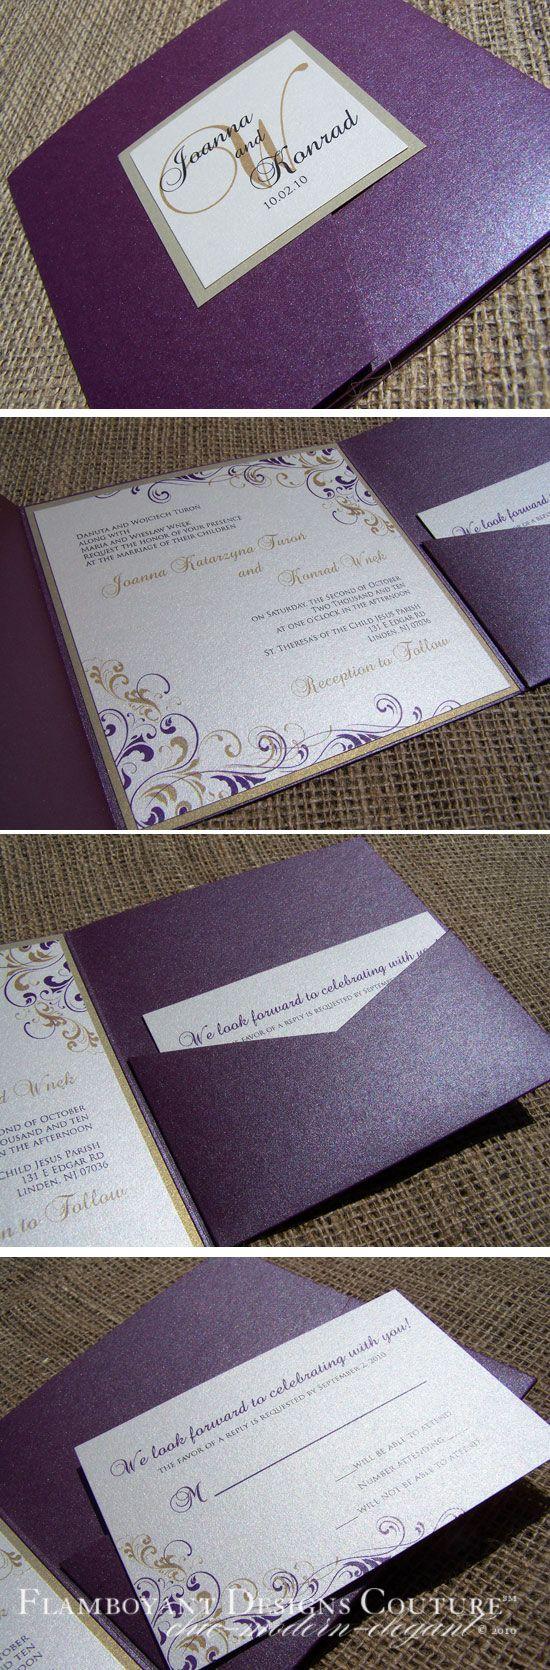 Plum and Gold Pocket Fold Invitations